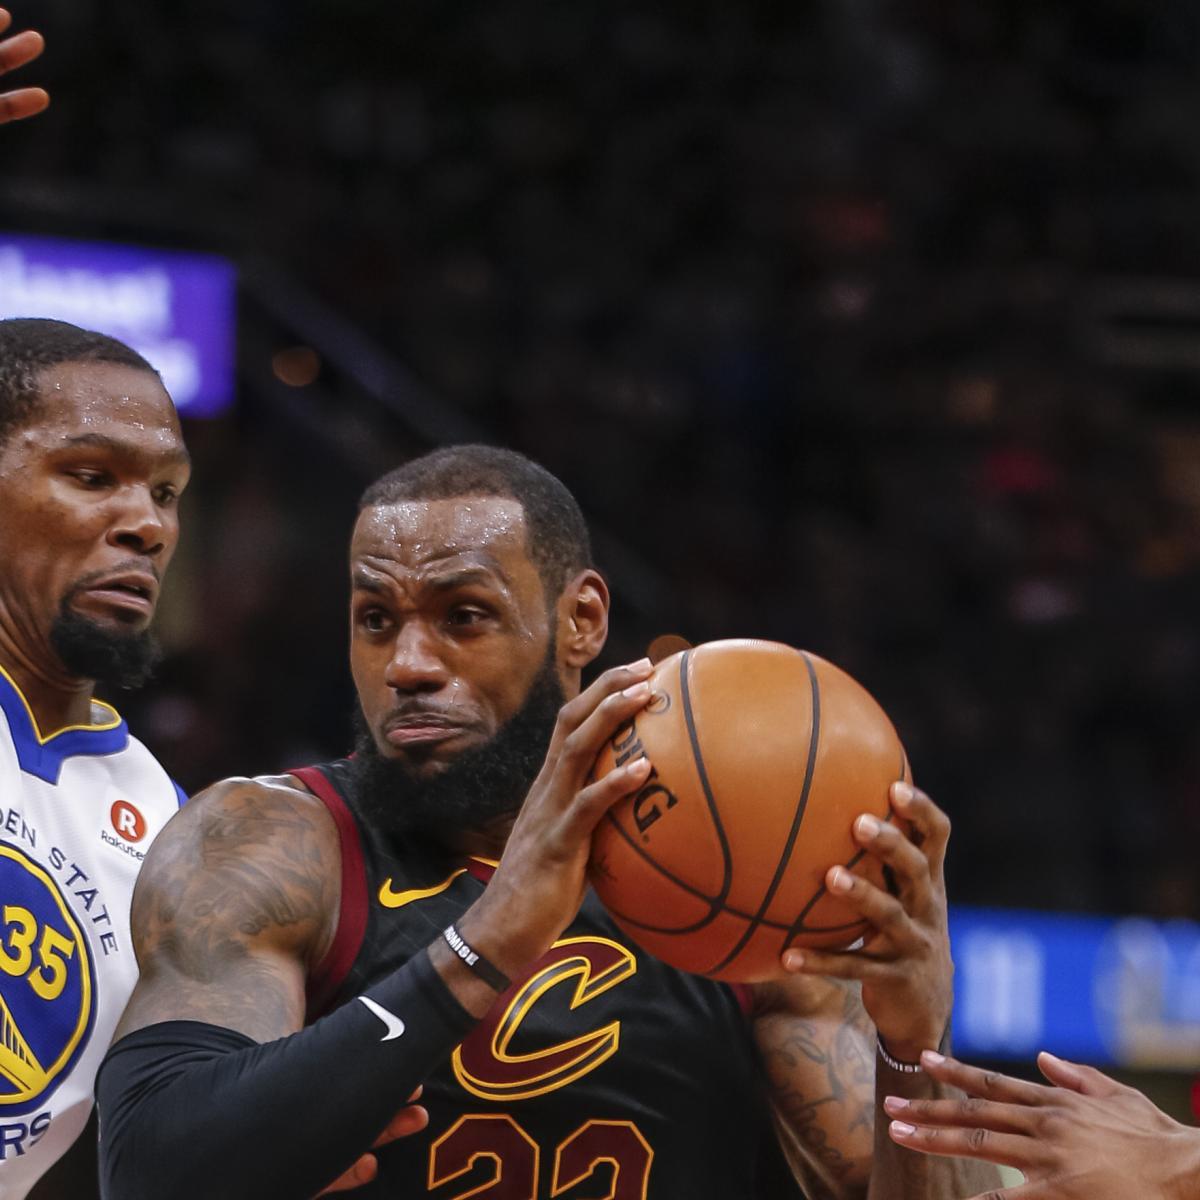 NBA Finals 2018: Cavaliers Vs. Warriors Game 1 Odds, Props